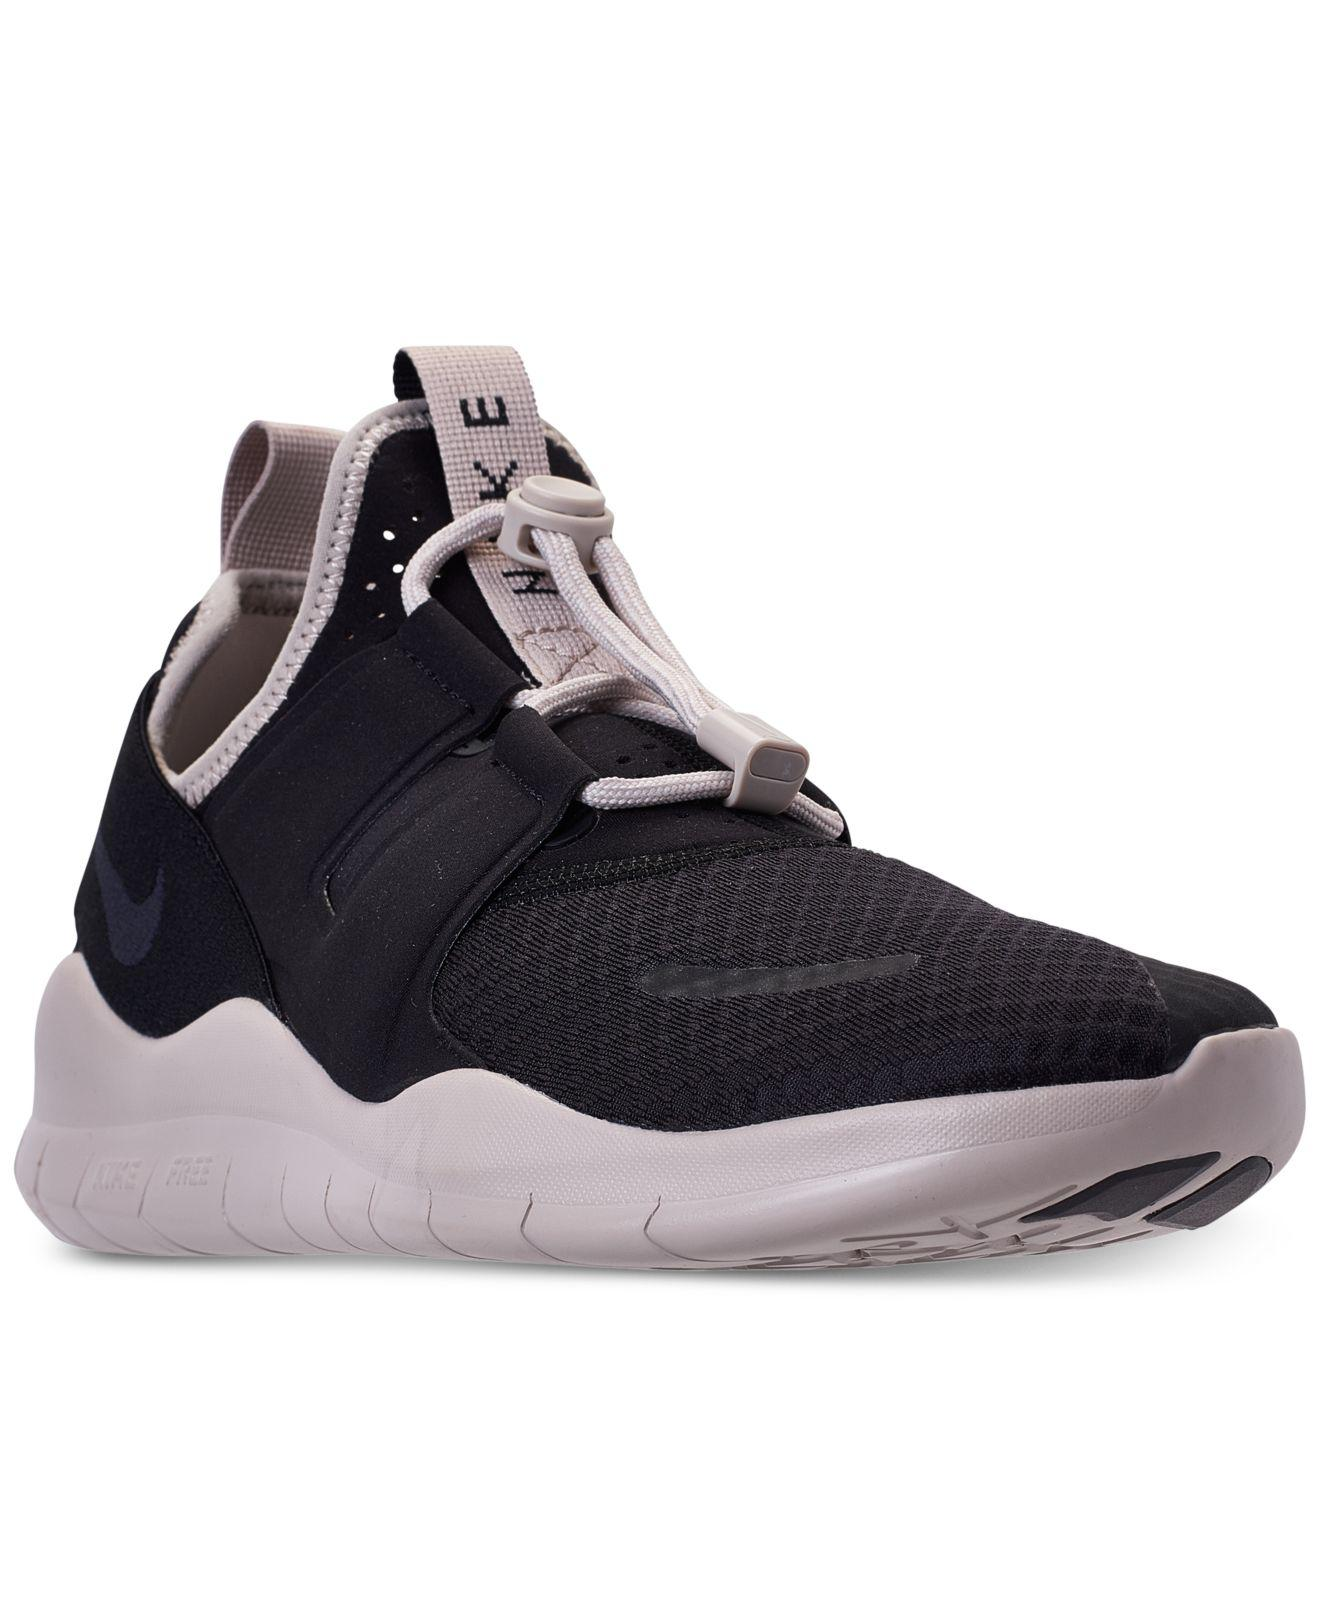 nike women's free rn cmtr 2018 running shoe